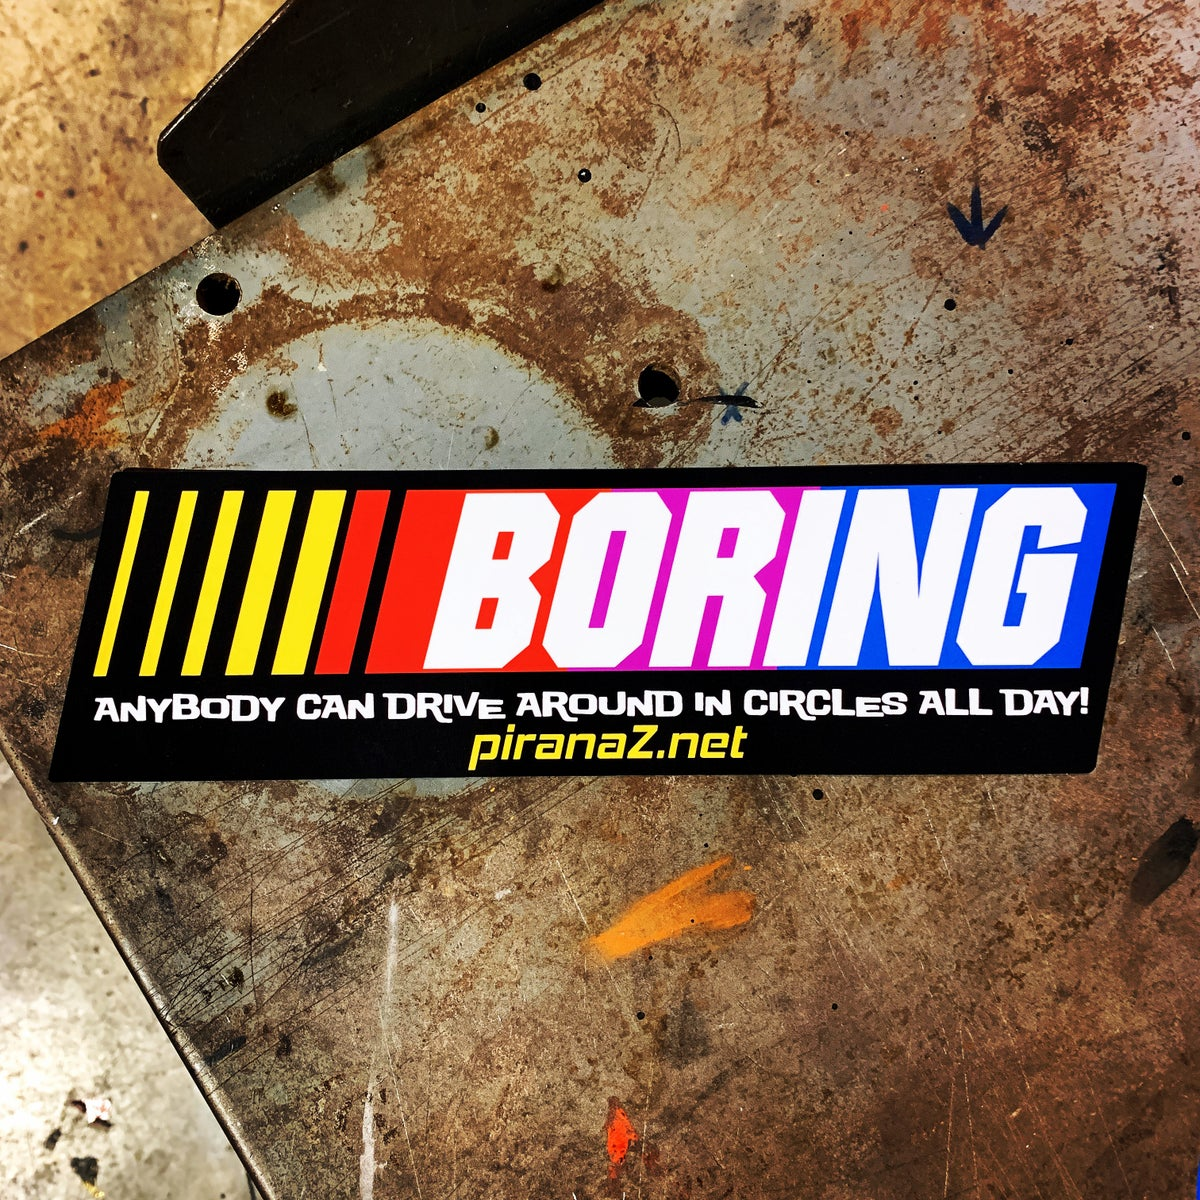 Image of Boring Sticker